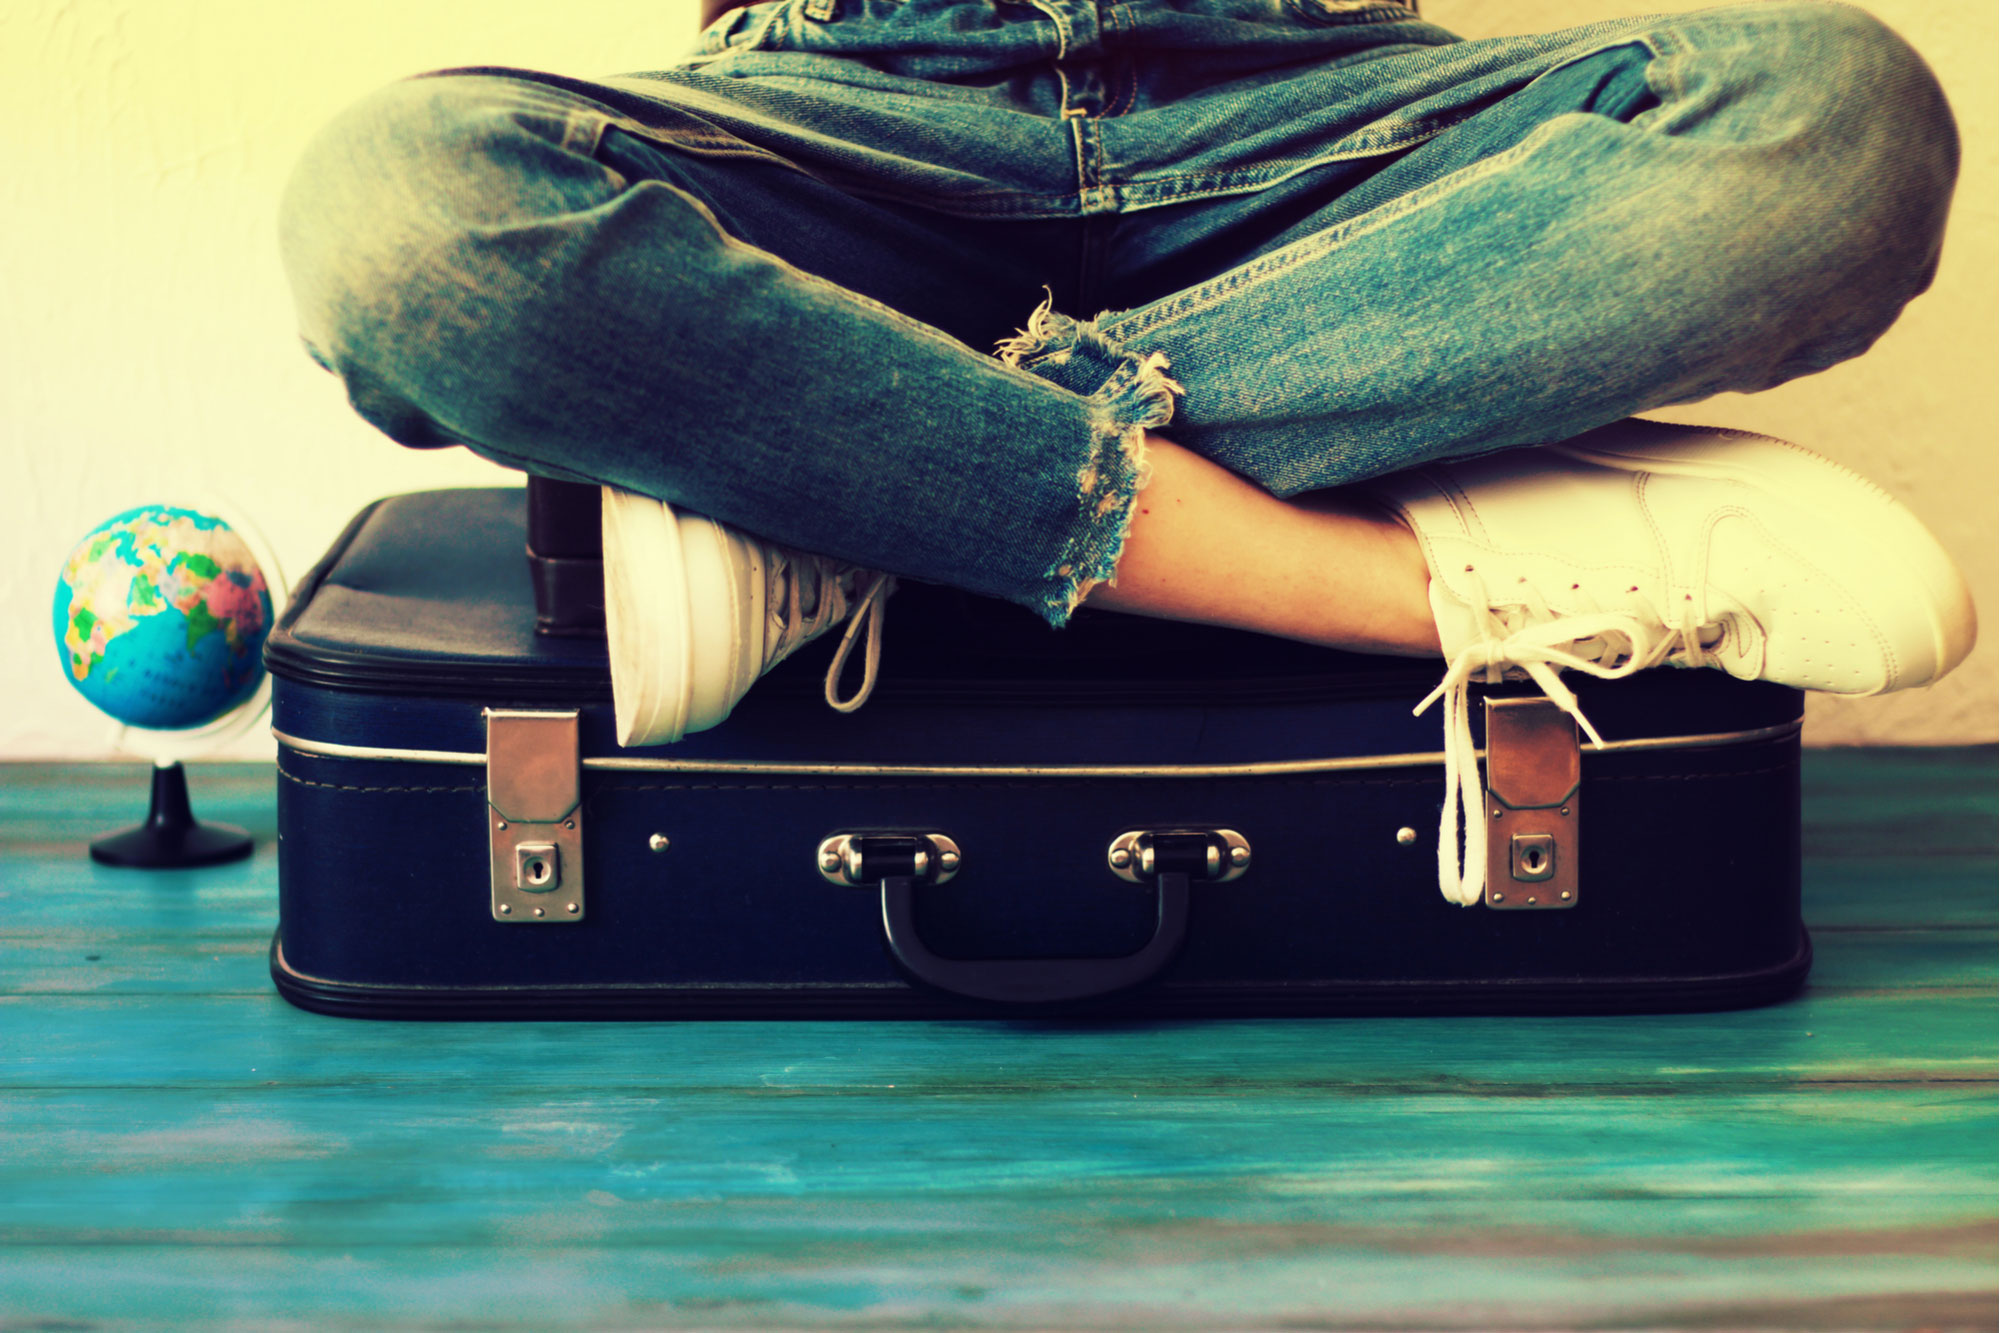 107 travel tips από τον Τάσο Δούση μετά από 25 χρόνια ταξιδιών!